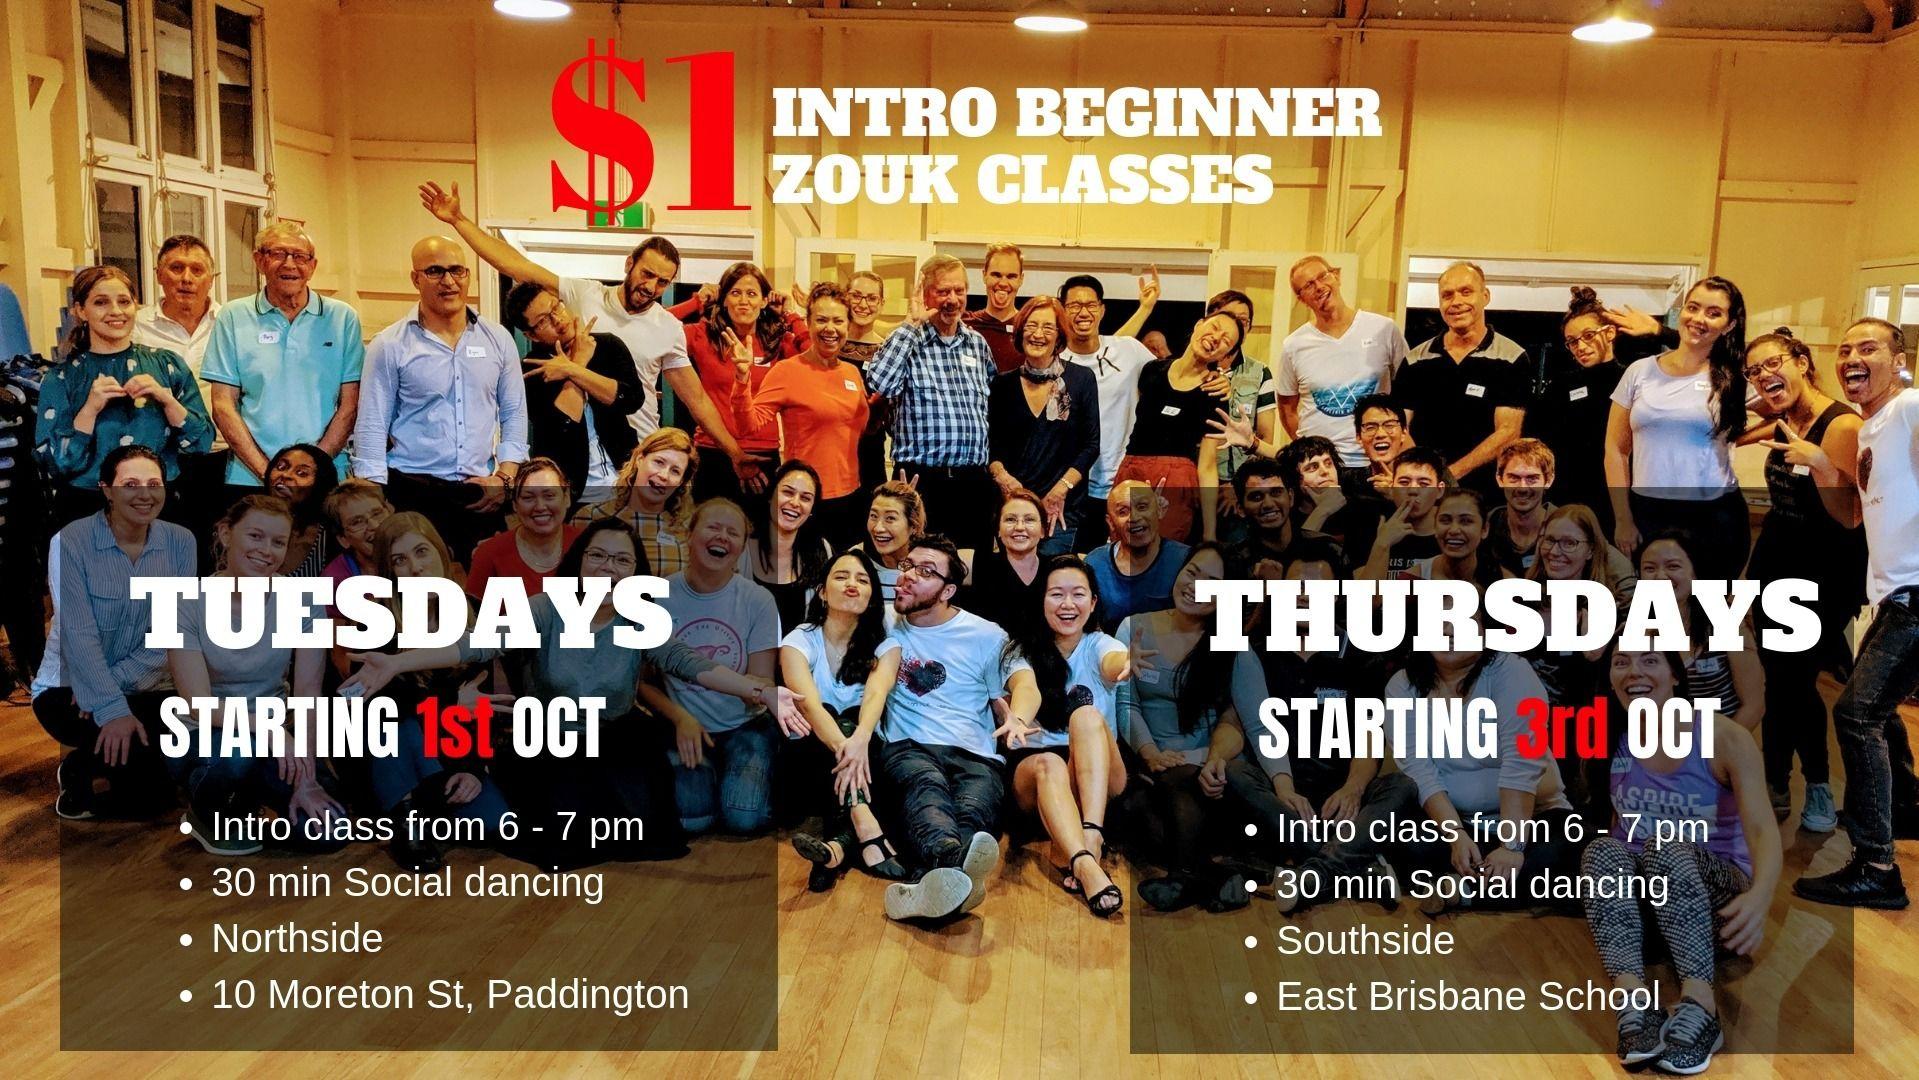 Brisbane Zouk Club, a Fun Latin Dance Style